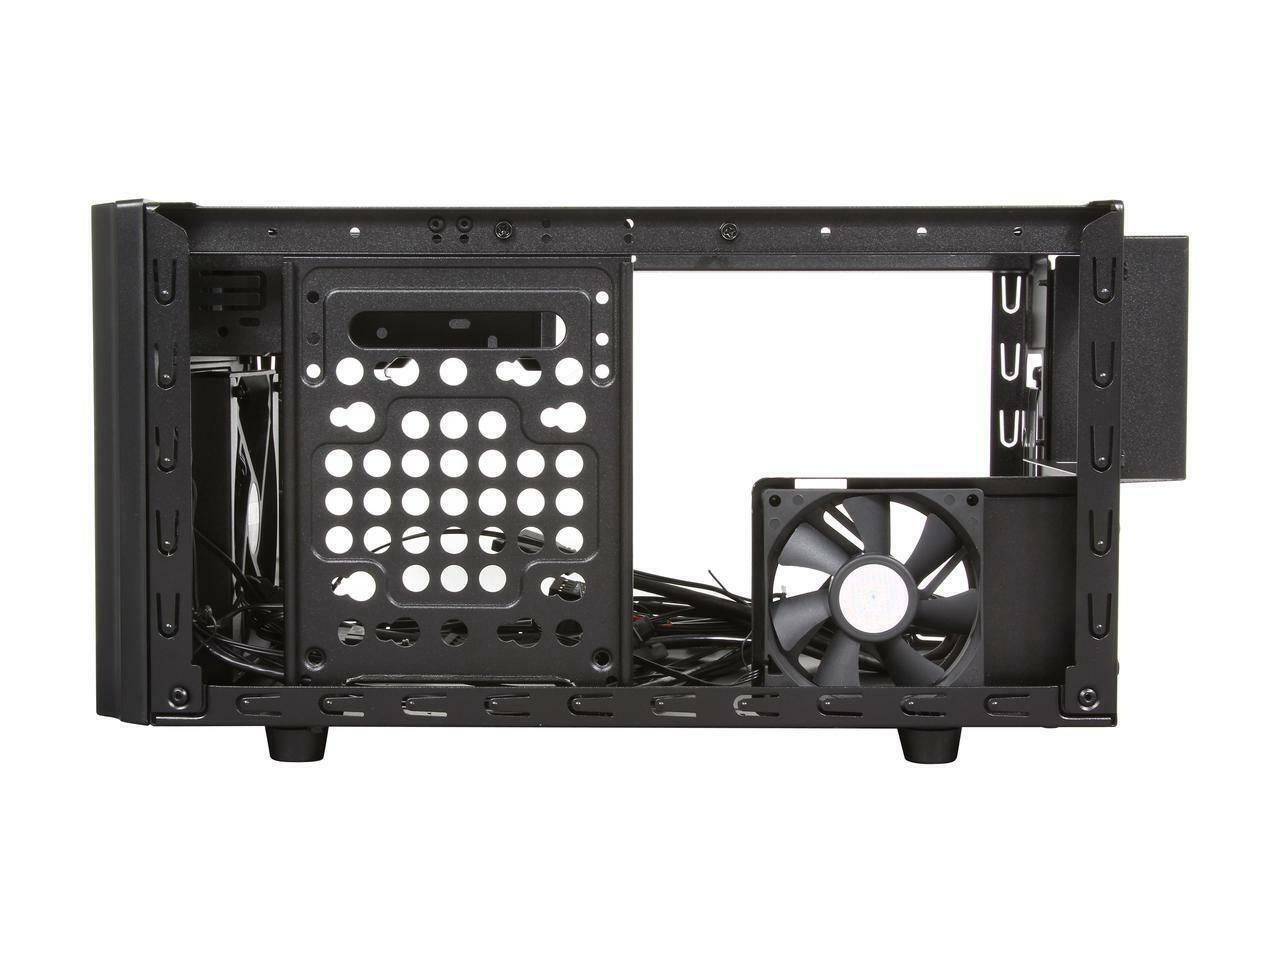 Cooler master mesh front panel best air compressor for truck tires